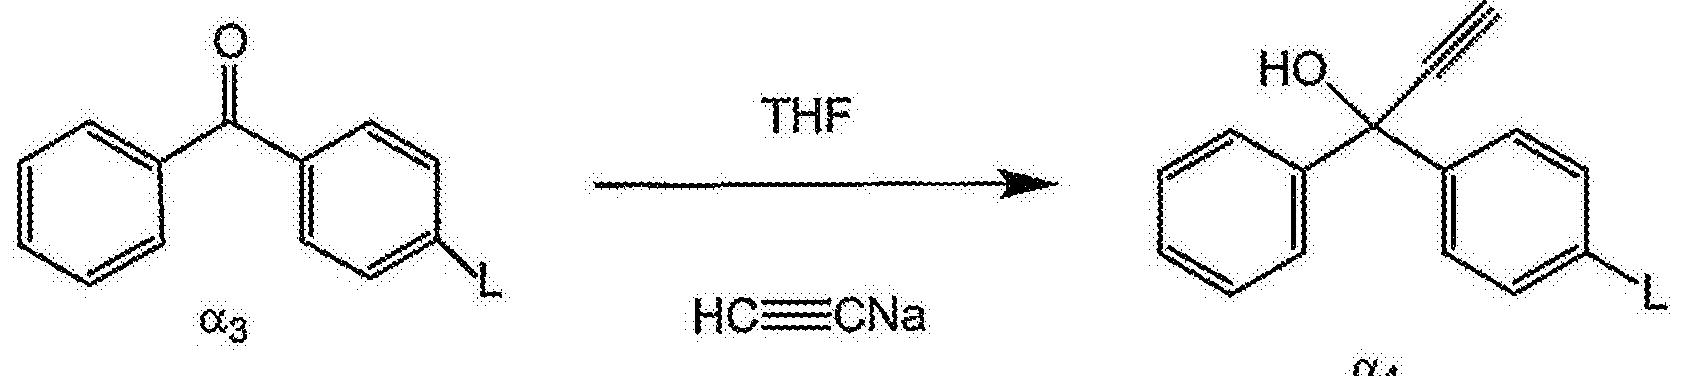 Figure CN105838349AD00762